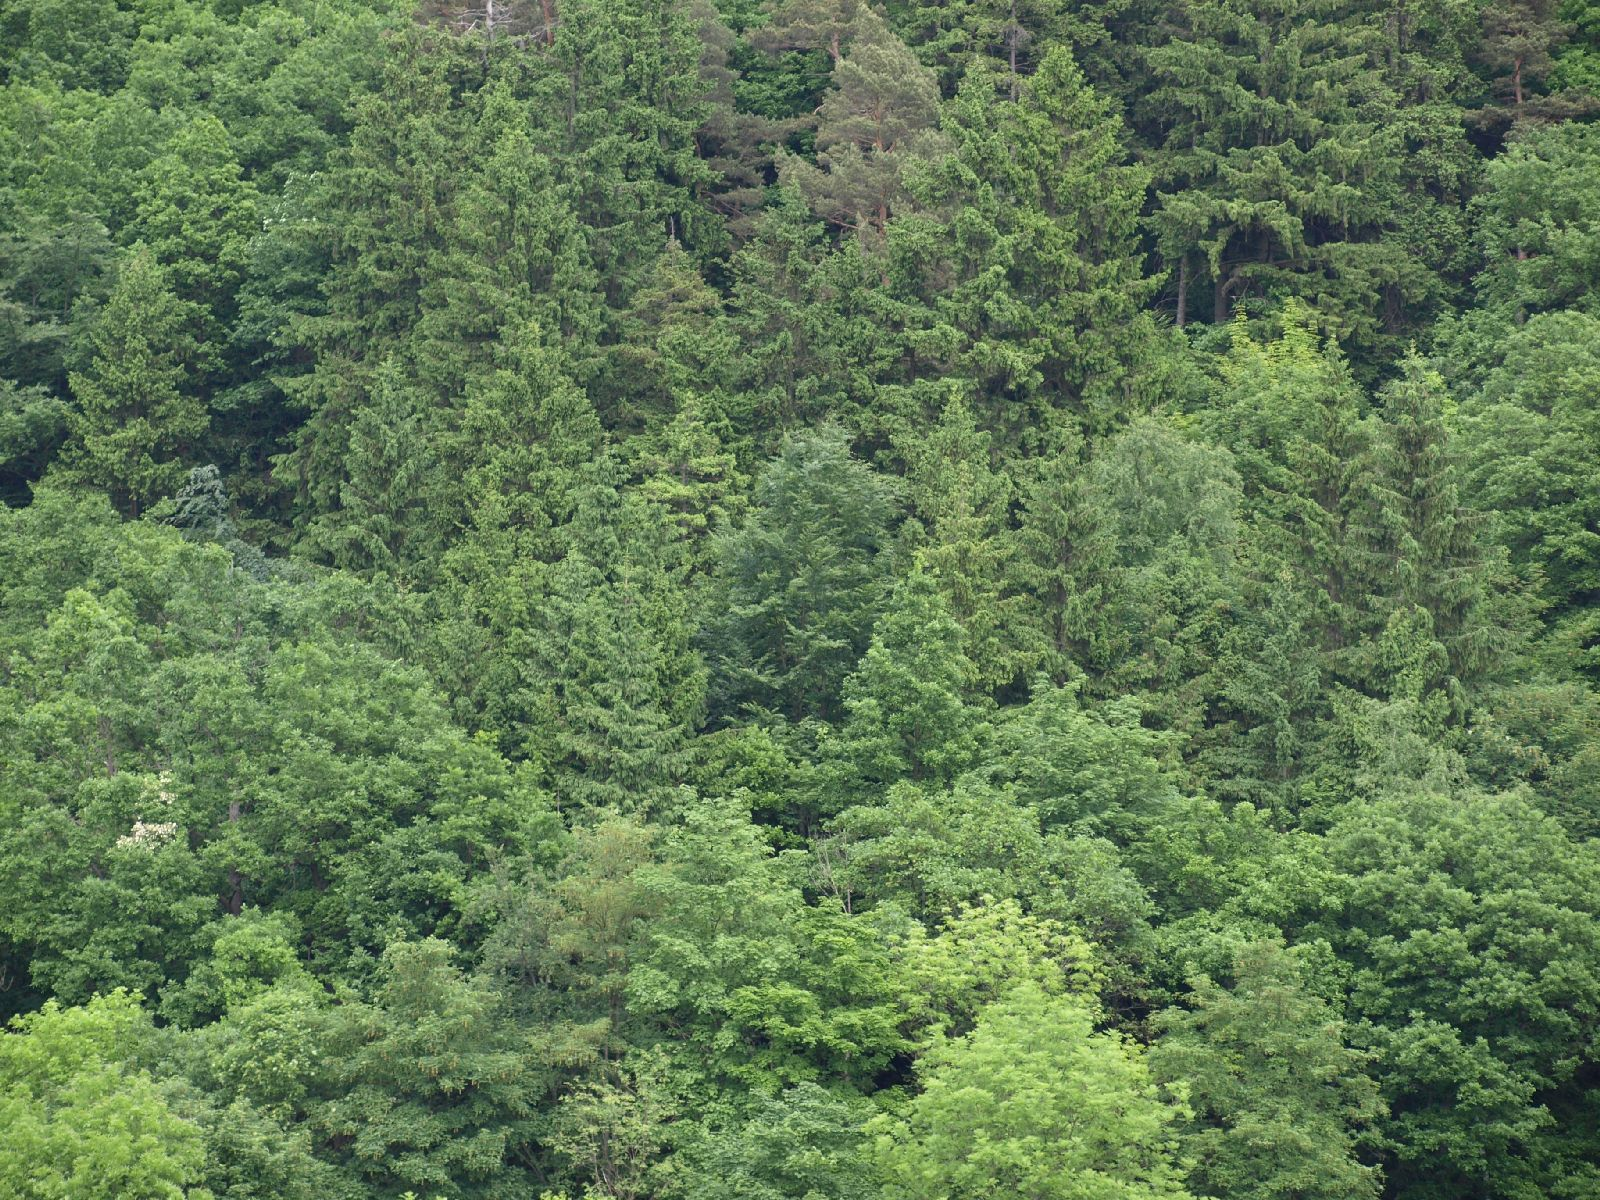 Pflanzen-Baum-Foto_Textur_B_P6036442